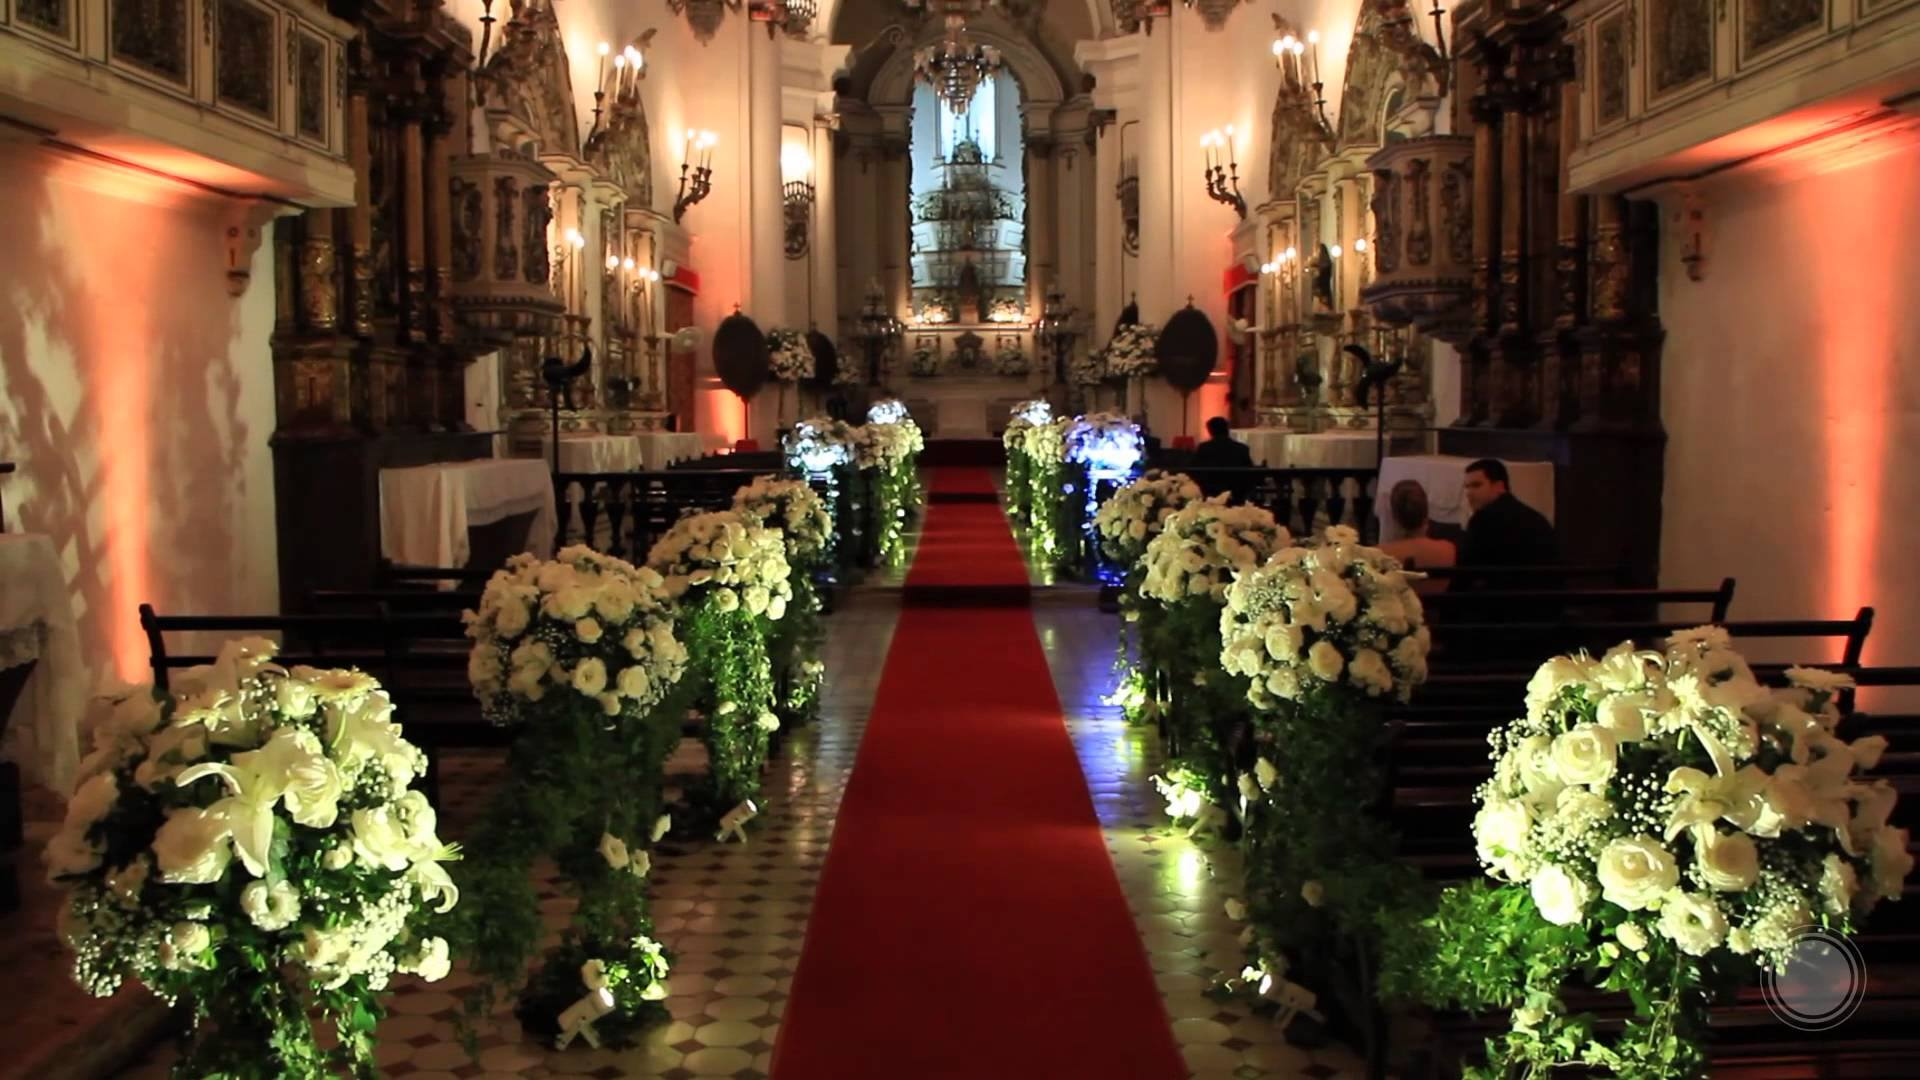 Foto_Igreja_Casamento_Guga_Weigert_e_Flavia_Ferraz_08102016